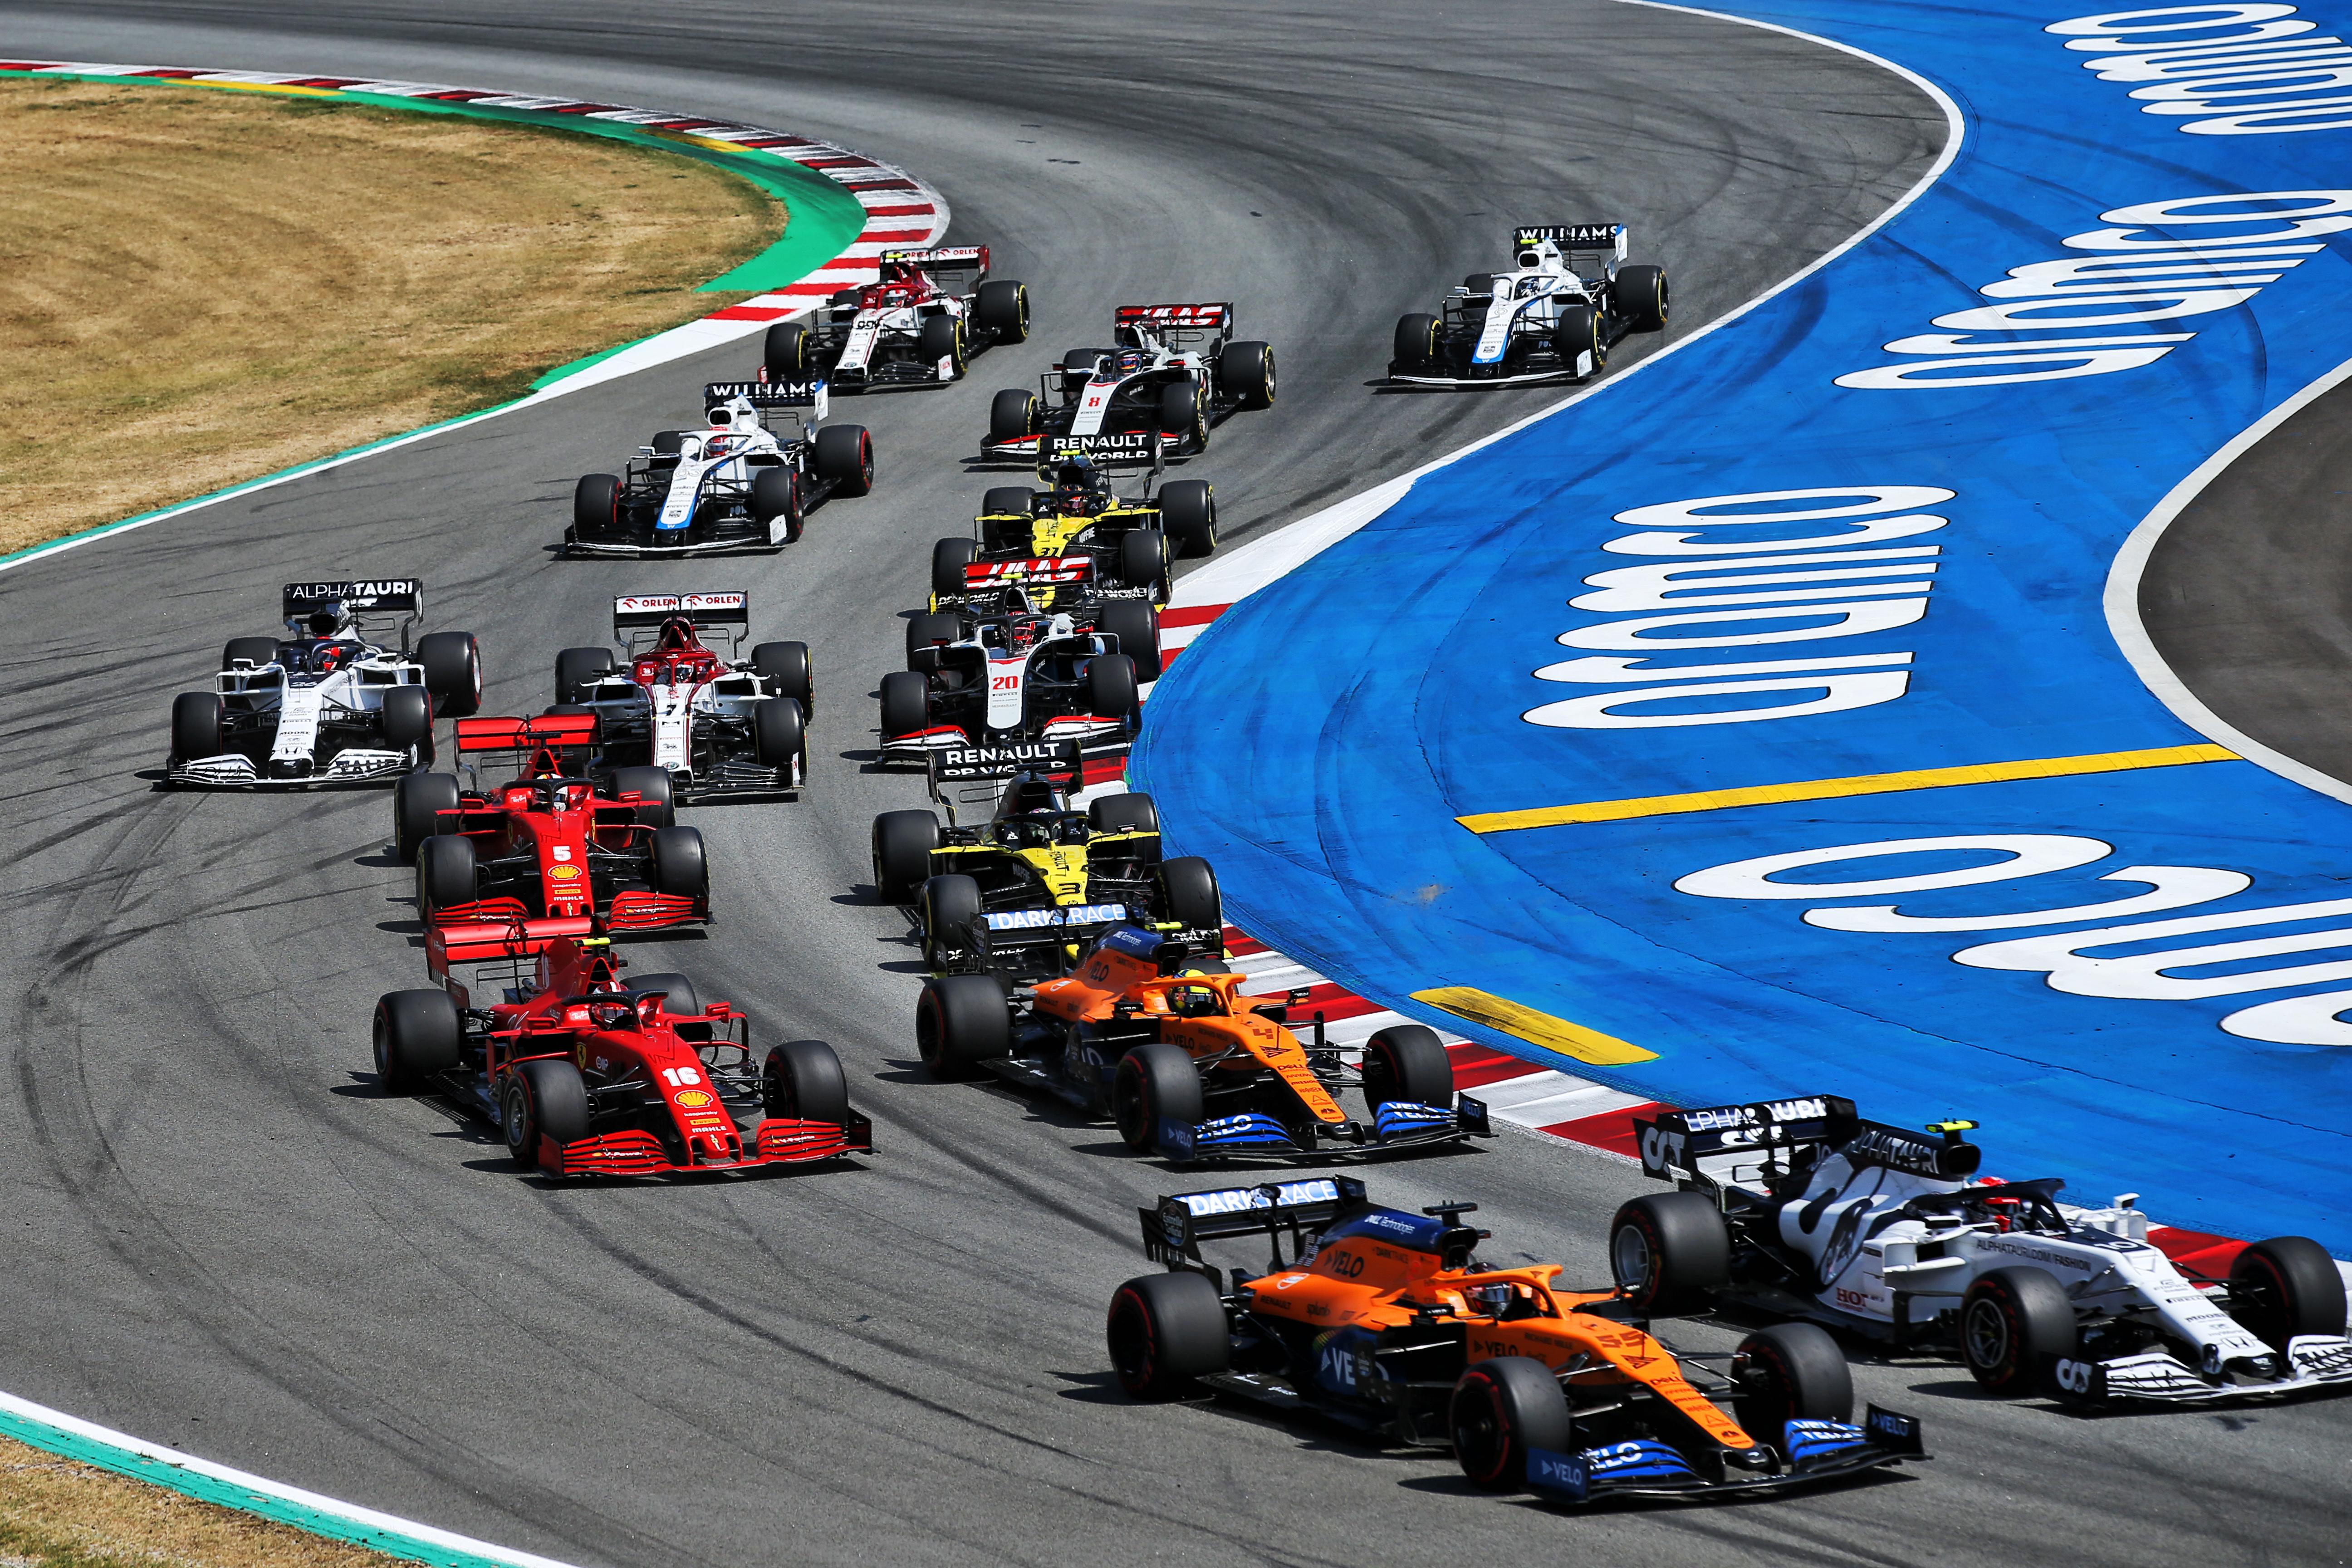 F1 start 2020 Spanish Grand Prix McLaren Ferrari Renault AlphaTauri Haas Williams